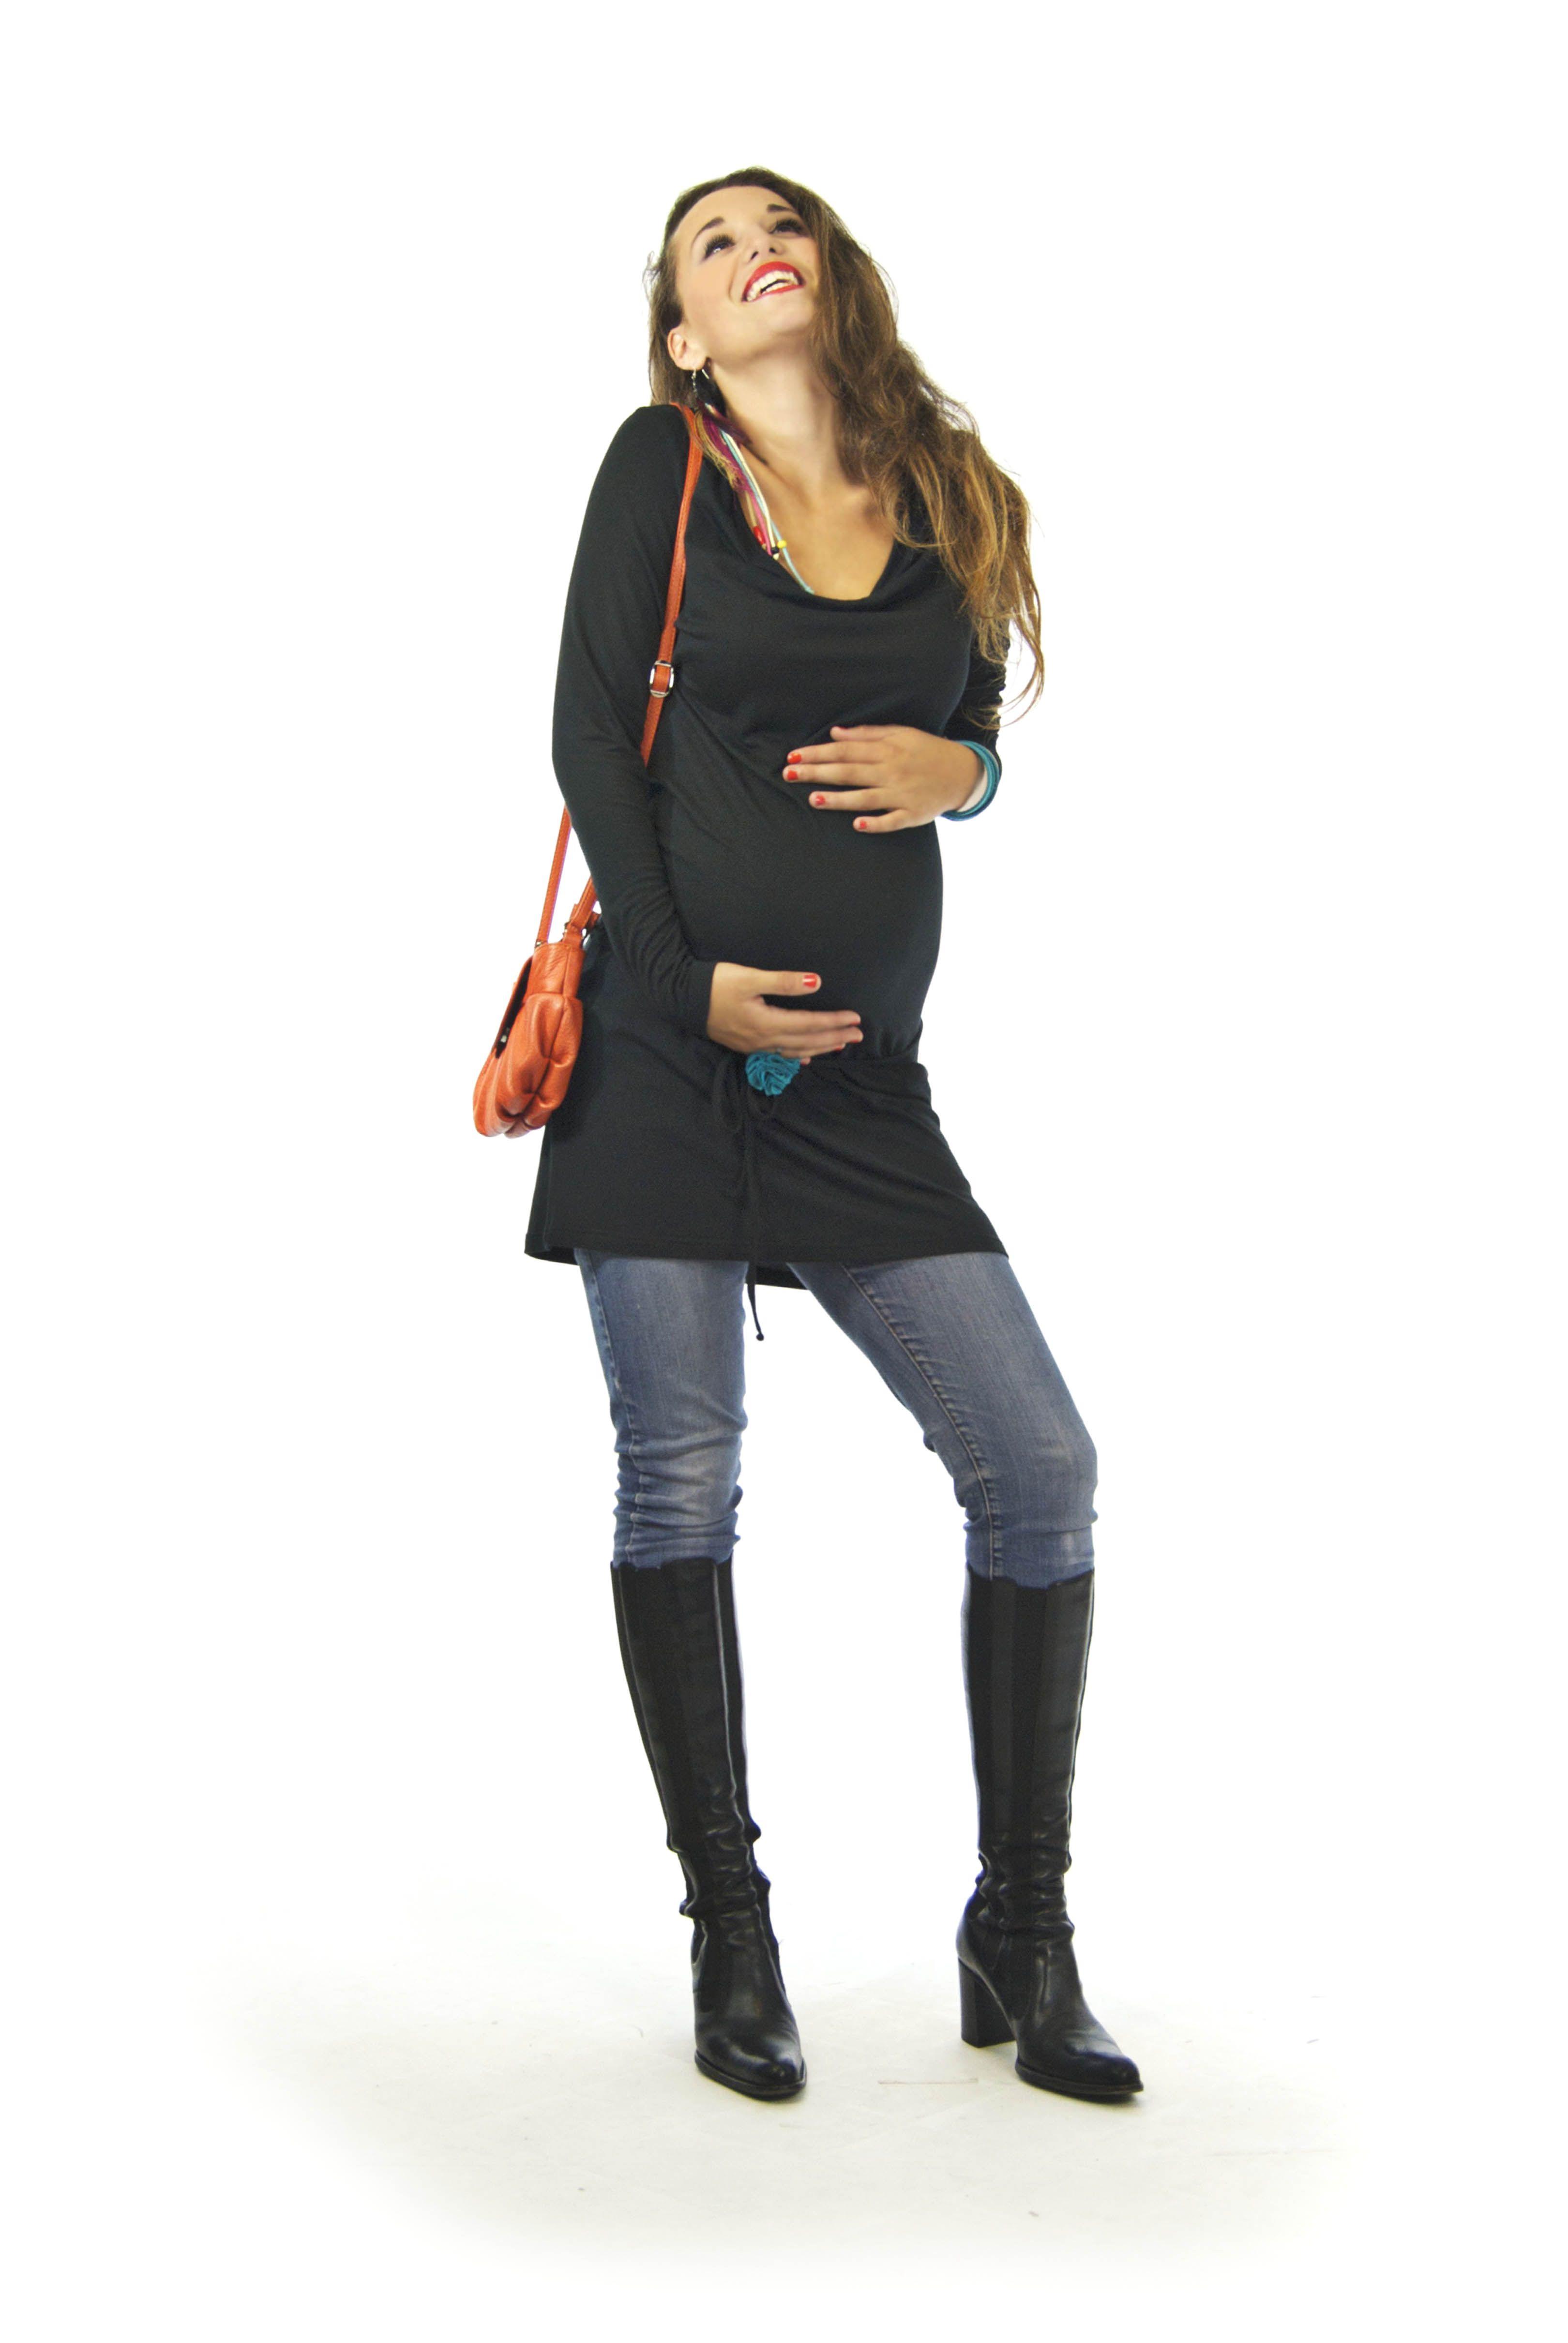 tenue grossesse tenue grossesse pinterest grossesse tenues et mode femme enceinte. Black Bedroom Furniture Sets. Home Design Ideas